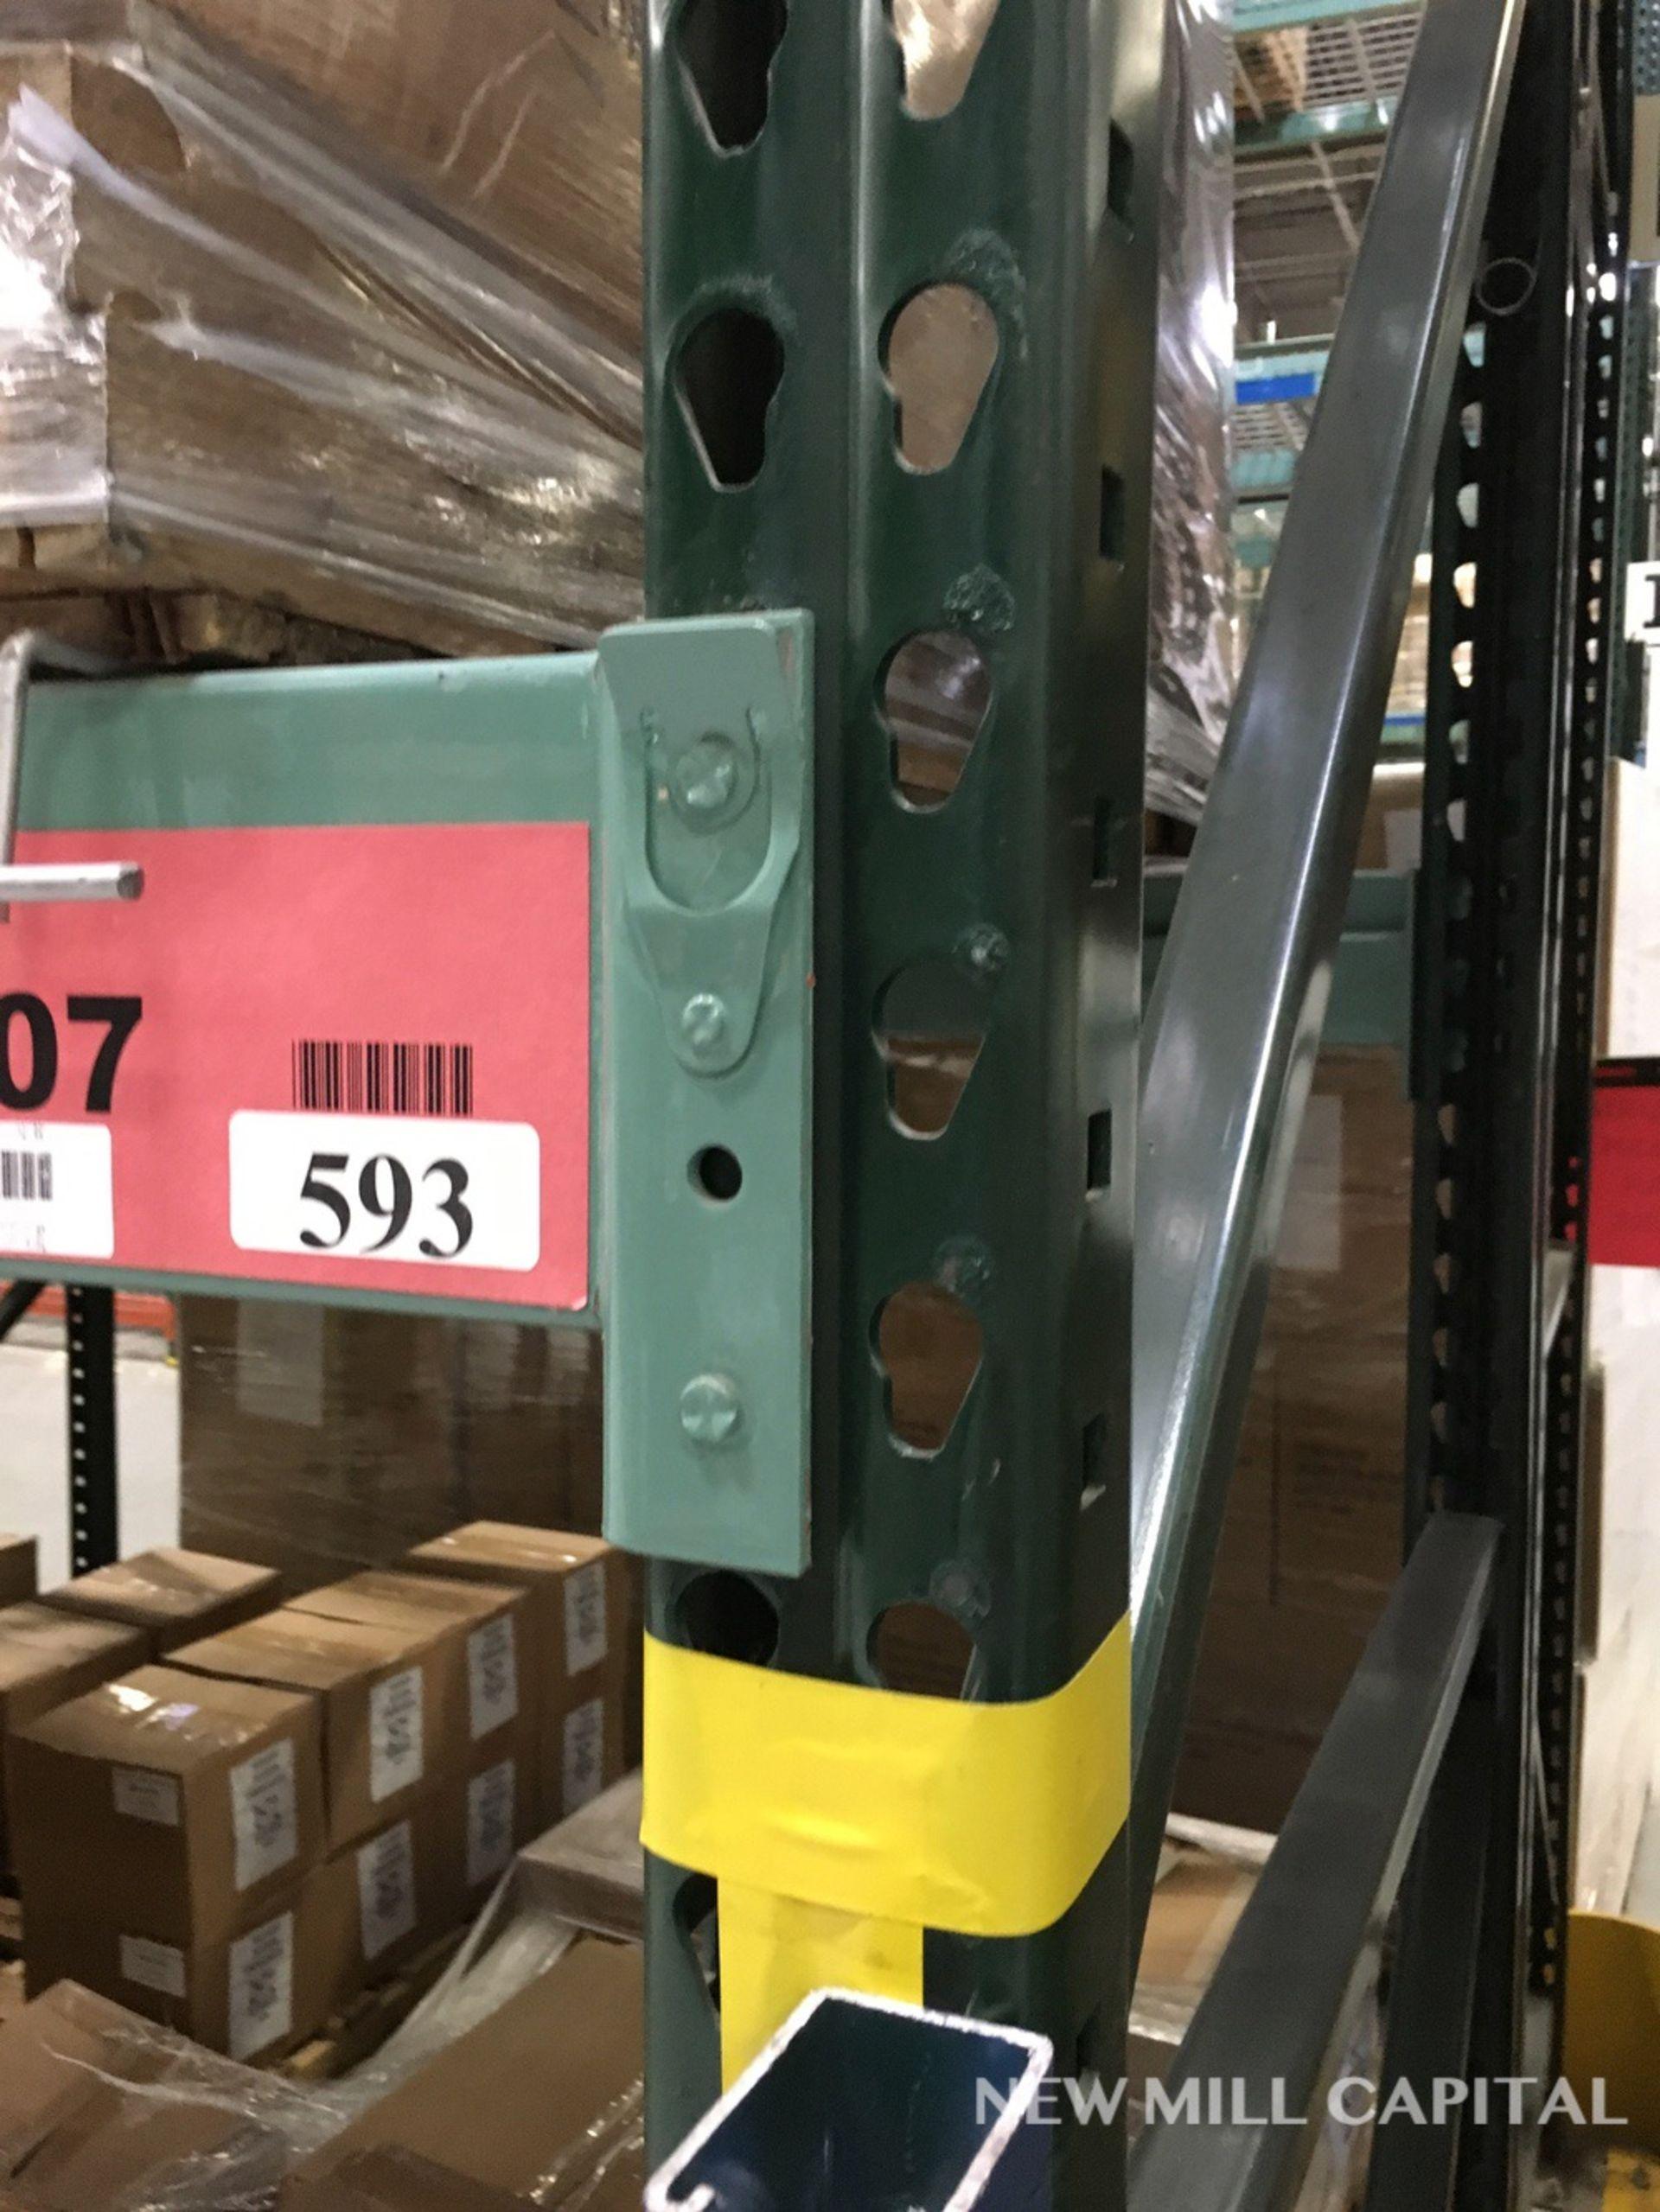 Lot 19 - Ridg-U-Rak Teardrop Pallet Racking, (32) Uprights (3in x 2.25in Columns,   Rig: See Lot Description